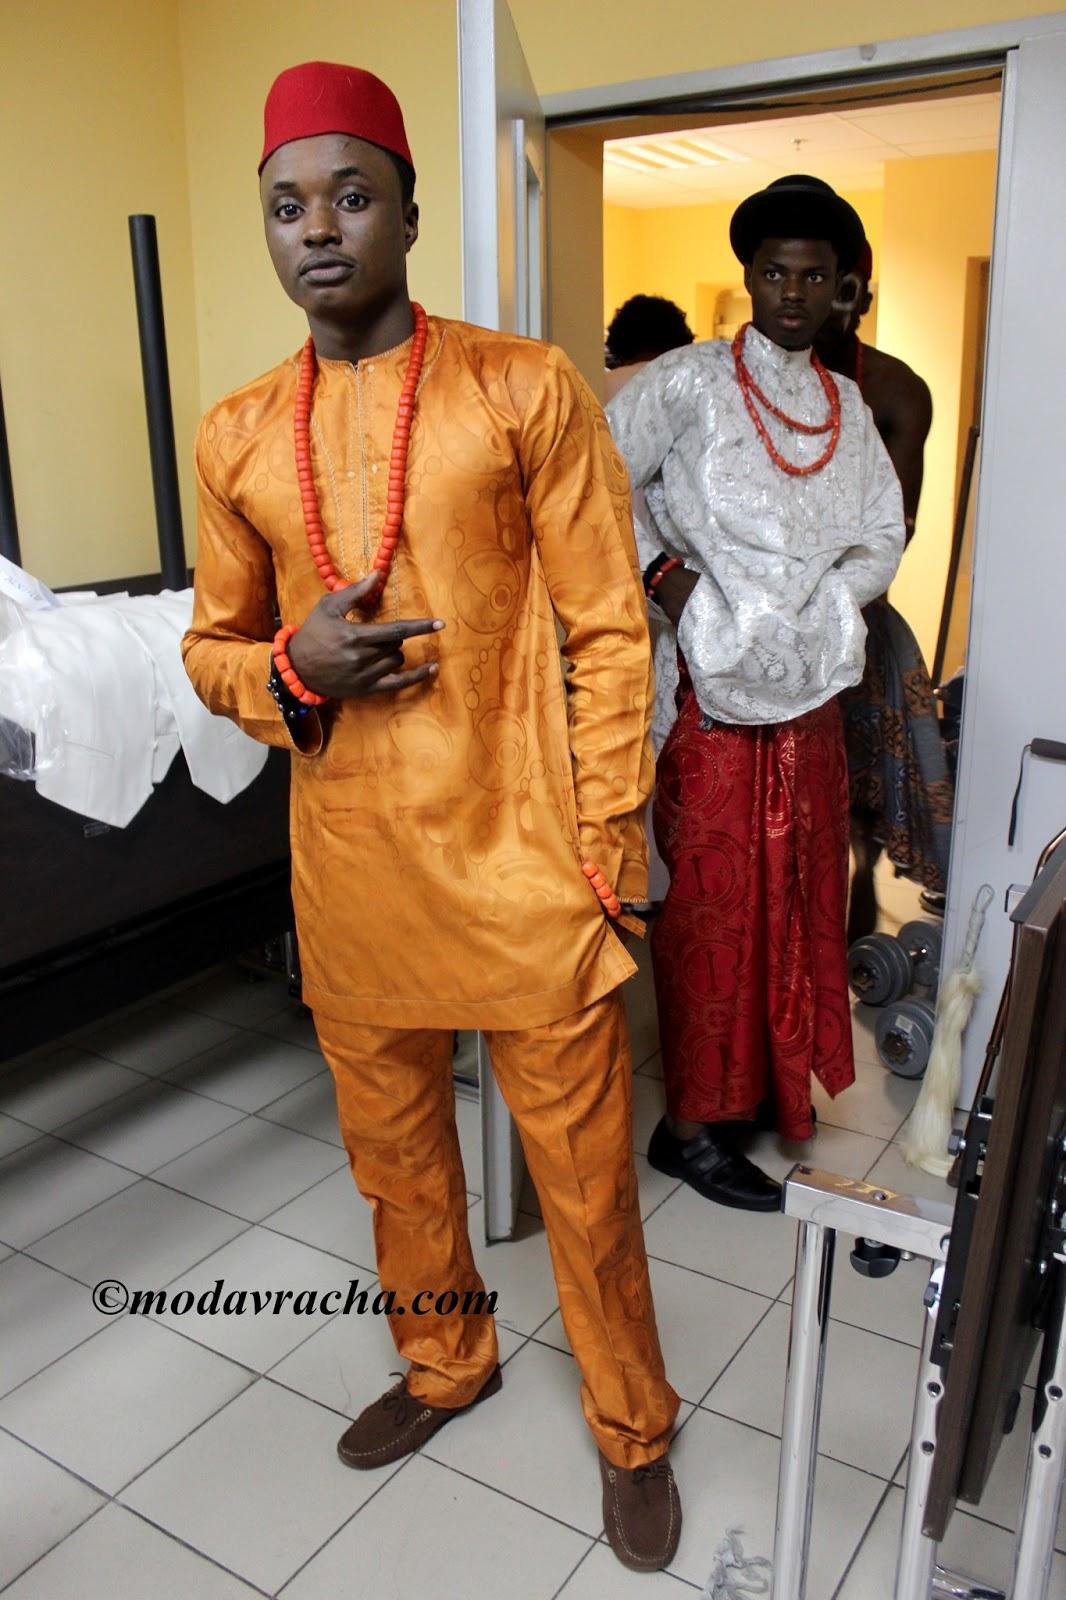 igbo nigerian men - photo #33